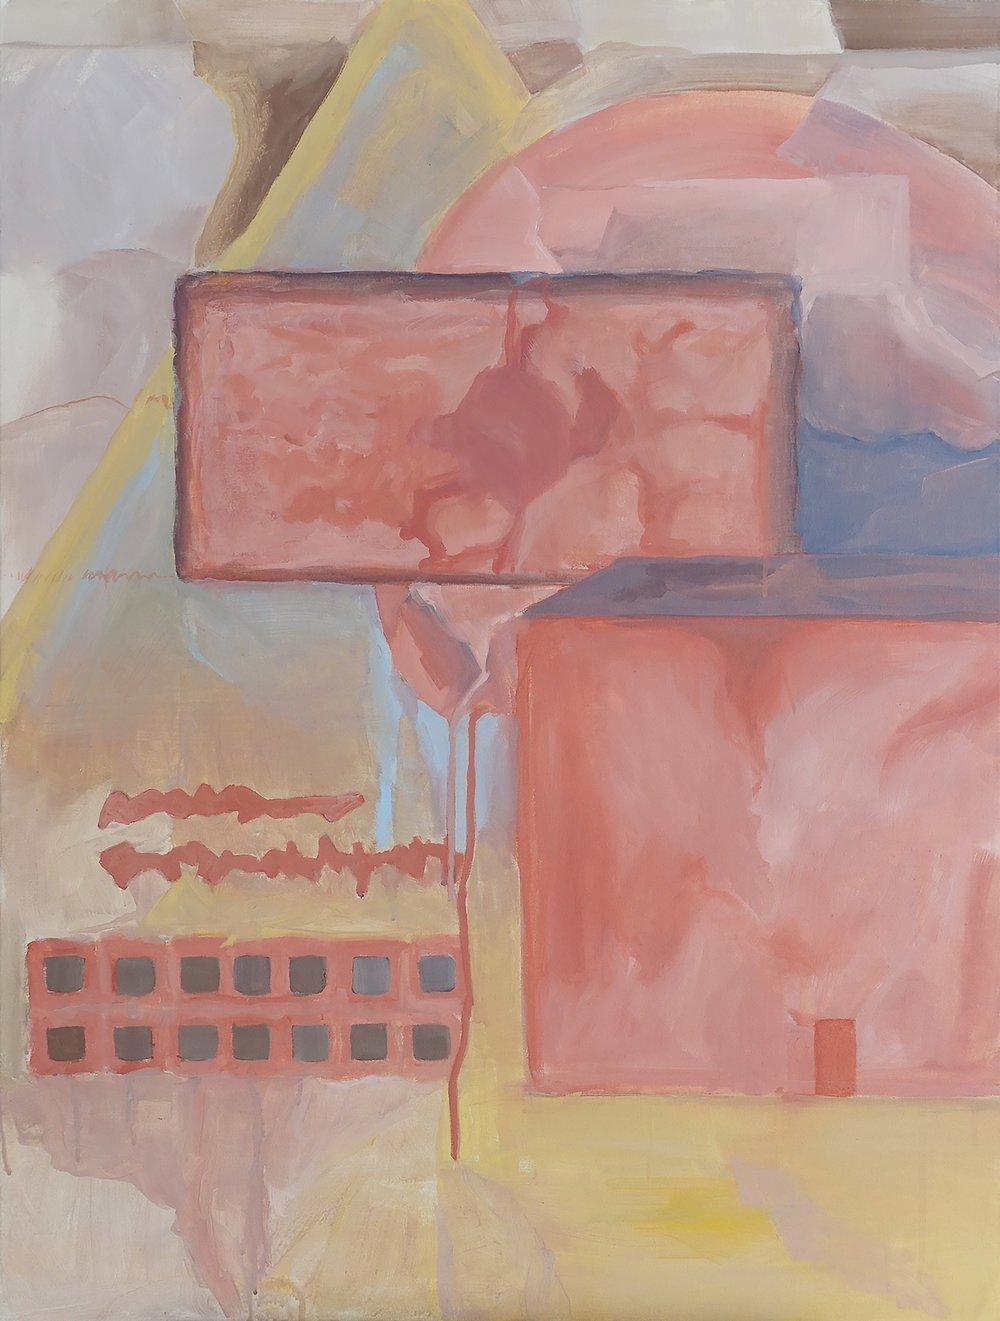 Untitled (Twenty F), 2018